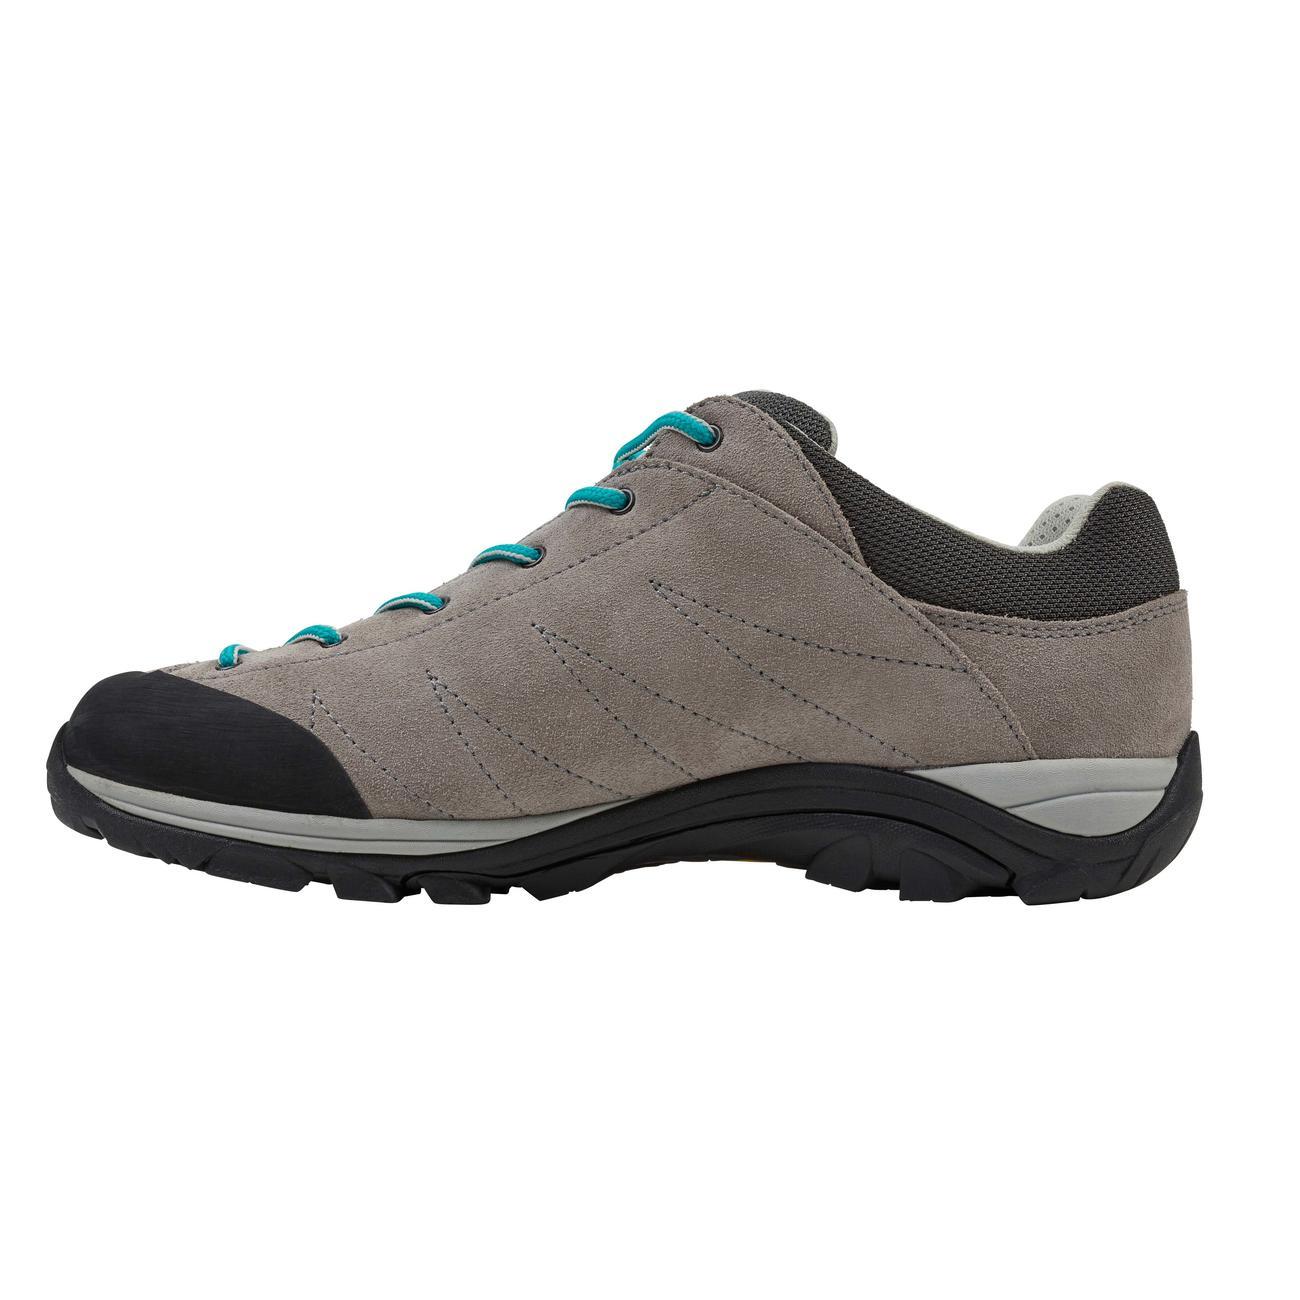 Schuhe leicht bequem